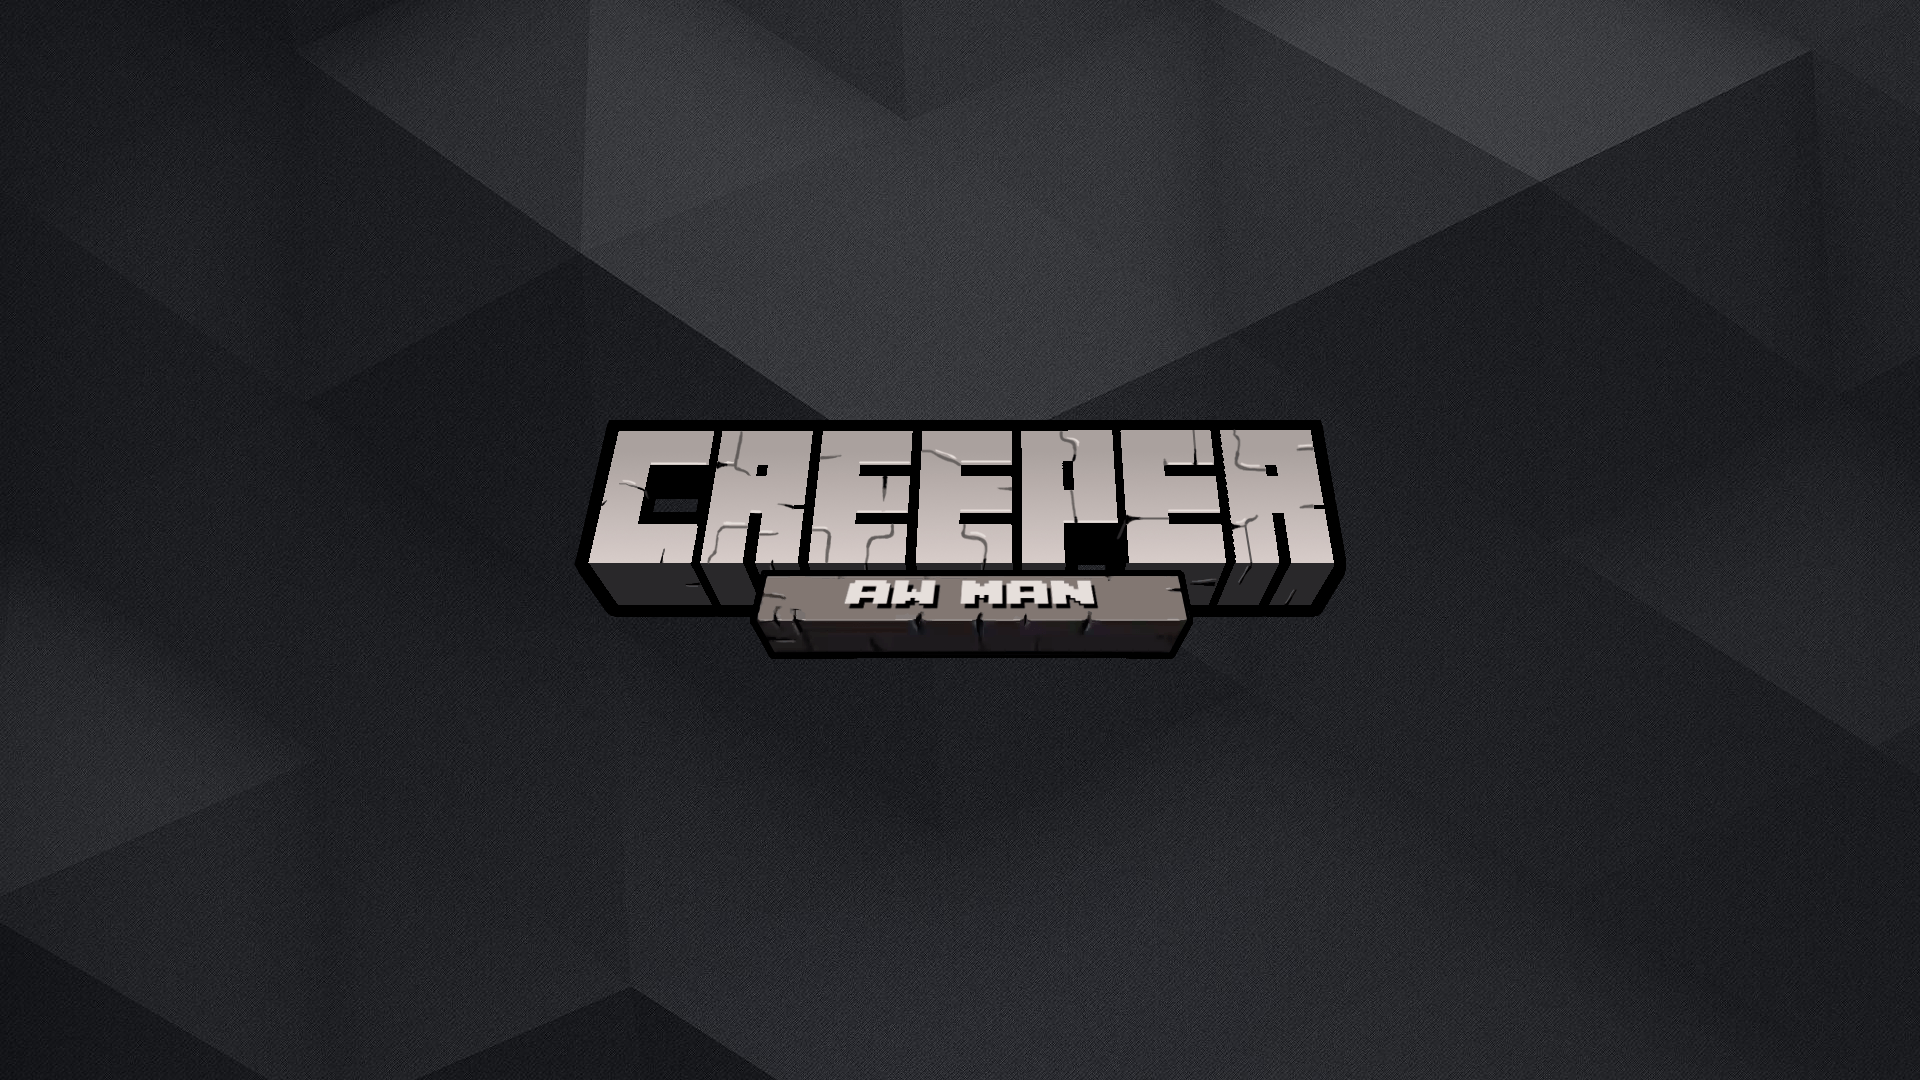 Minecraft Wallpaper Creeper Aww Man